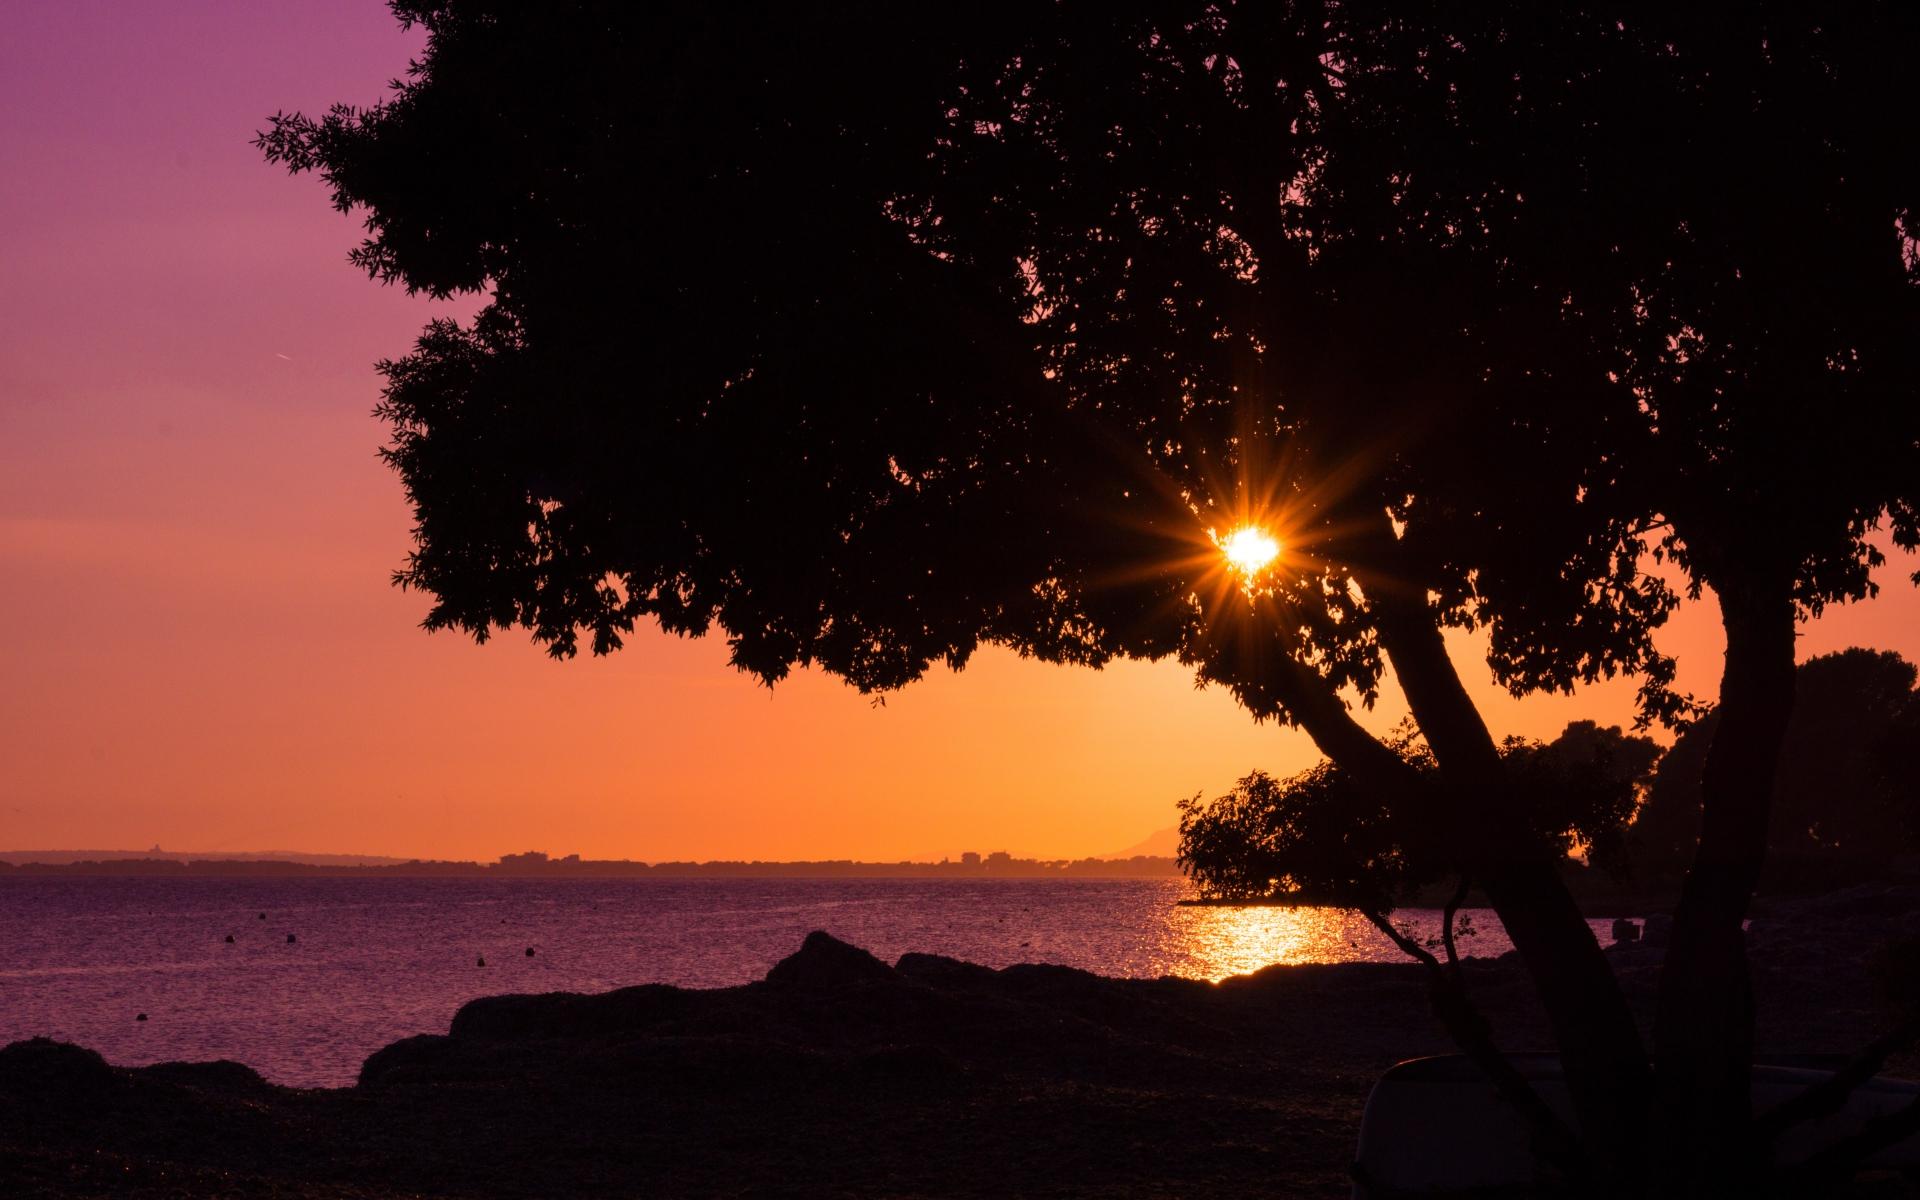 Картинки Дерево, закат, пляж фото и обои на рабочий стол